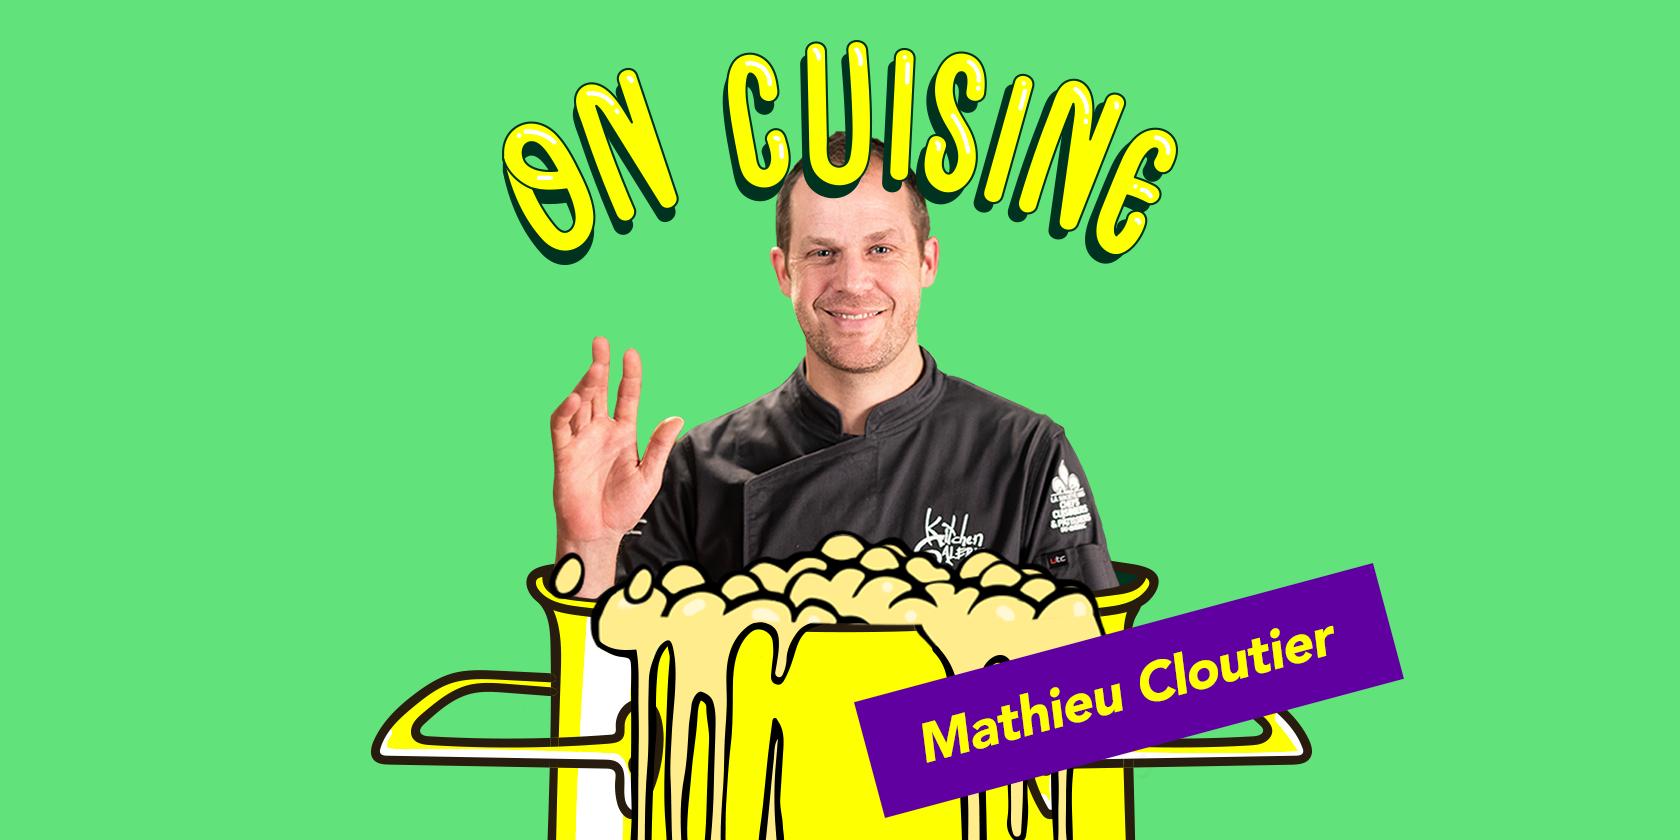 On cuisine Mathieu Cloutier, chef du resto Kitchen Galerie